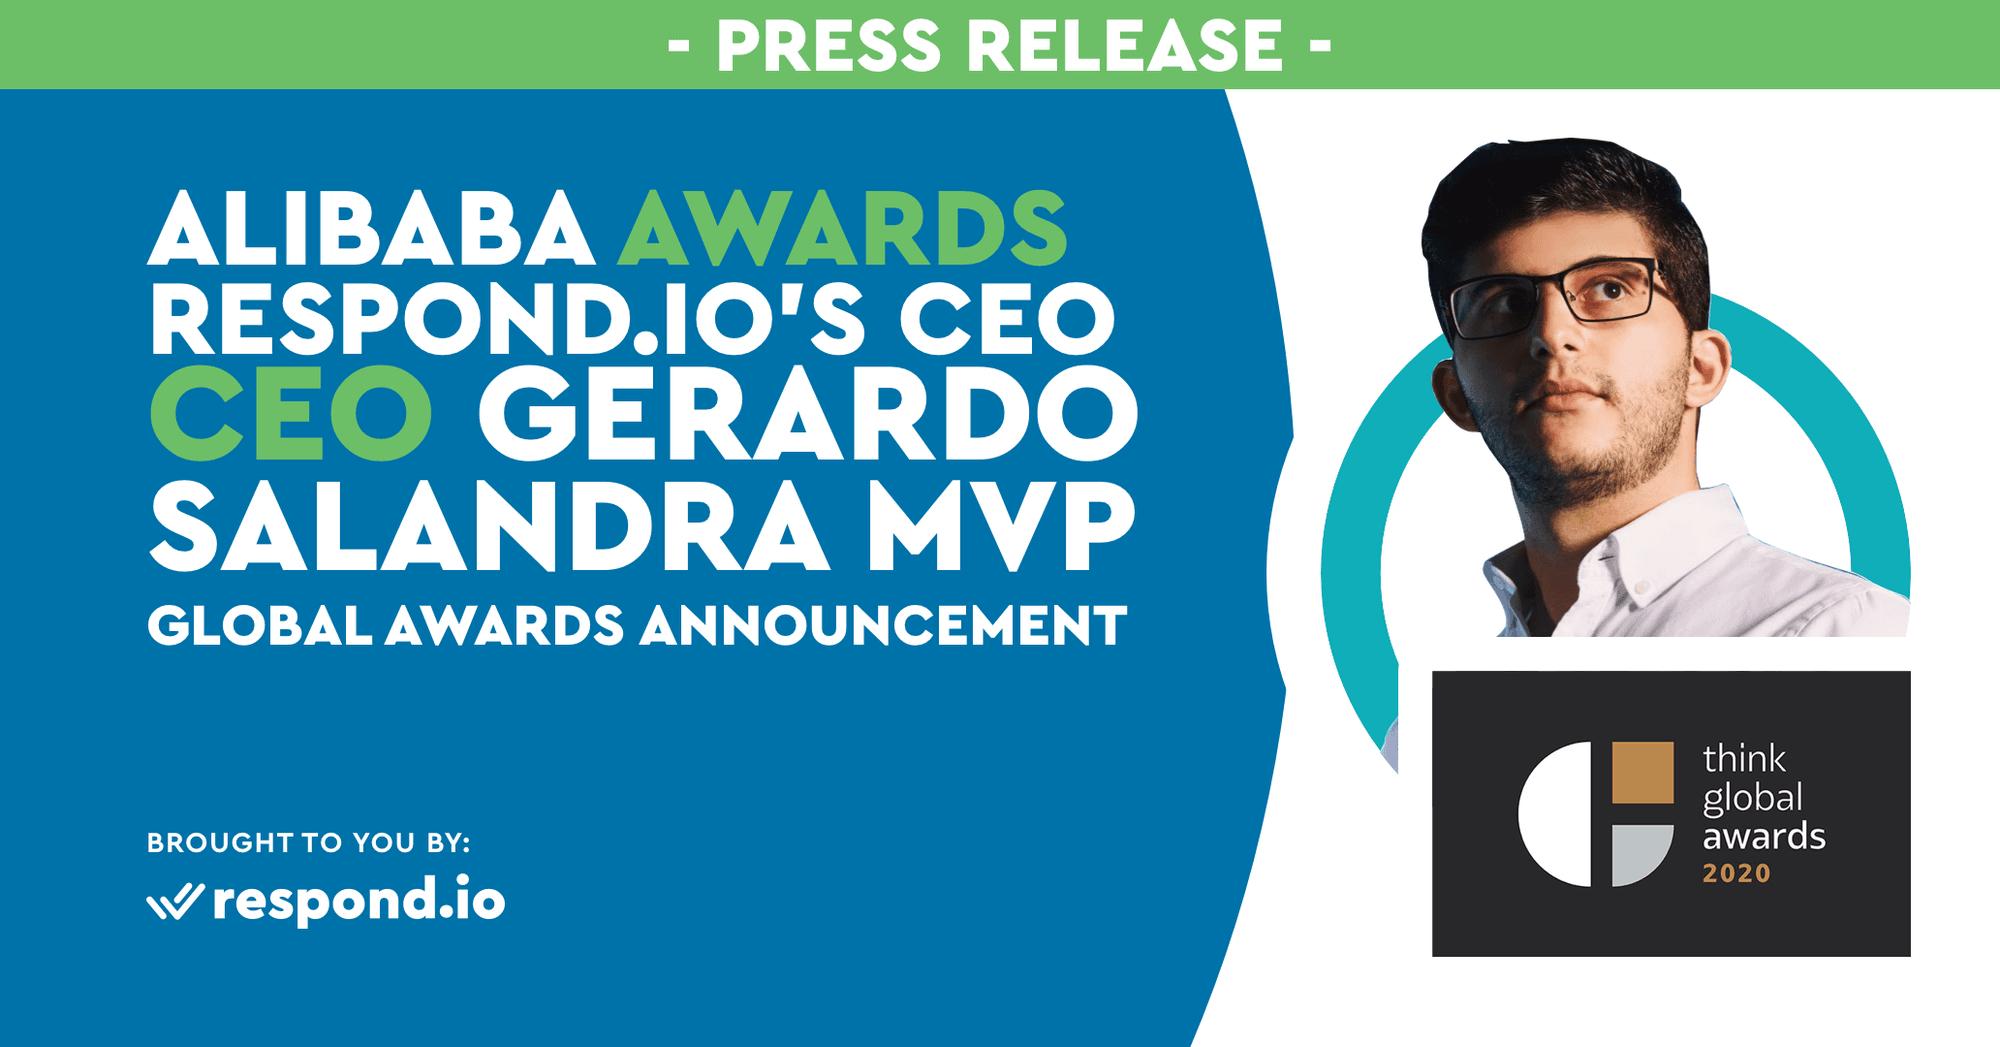 Alibaba Awards Rocketbots' CEO Gerardo Salandra MVP in Global Awards Announcement